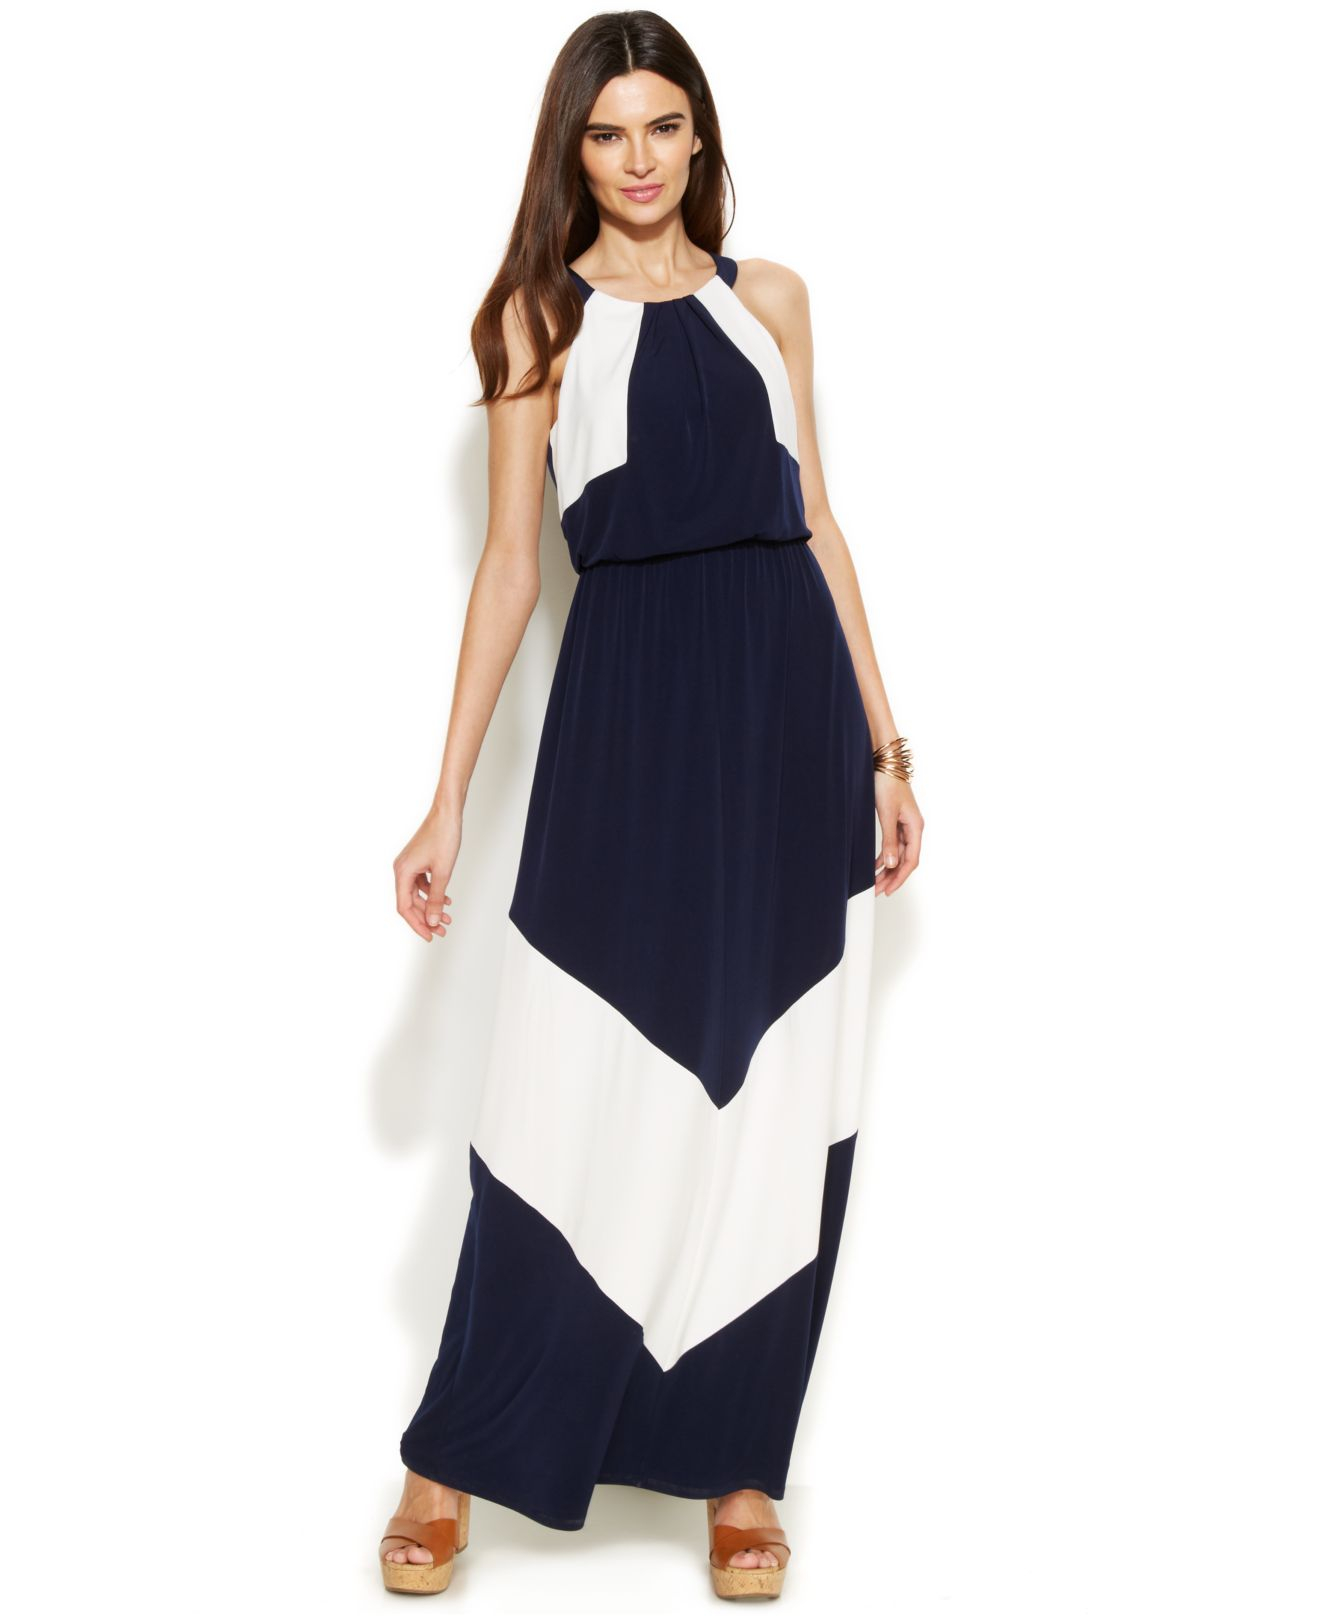 e688a345699 Navy Blue And White Chevron Maxi Dress - Gomes Weine AG